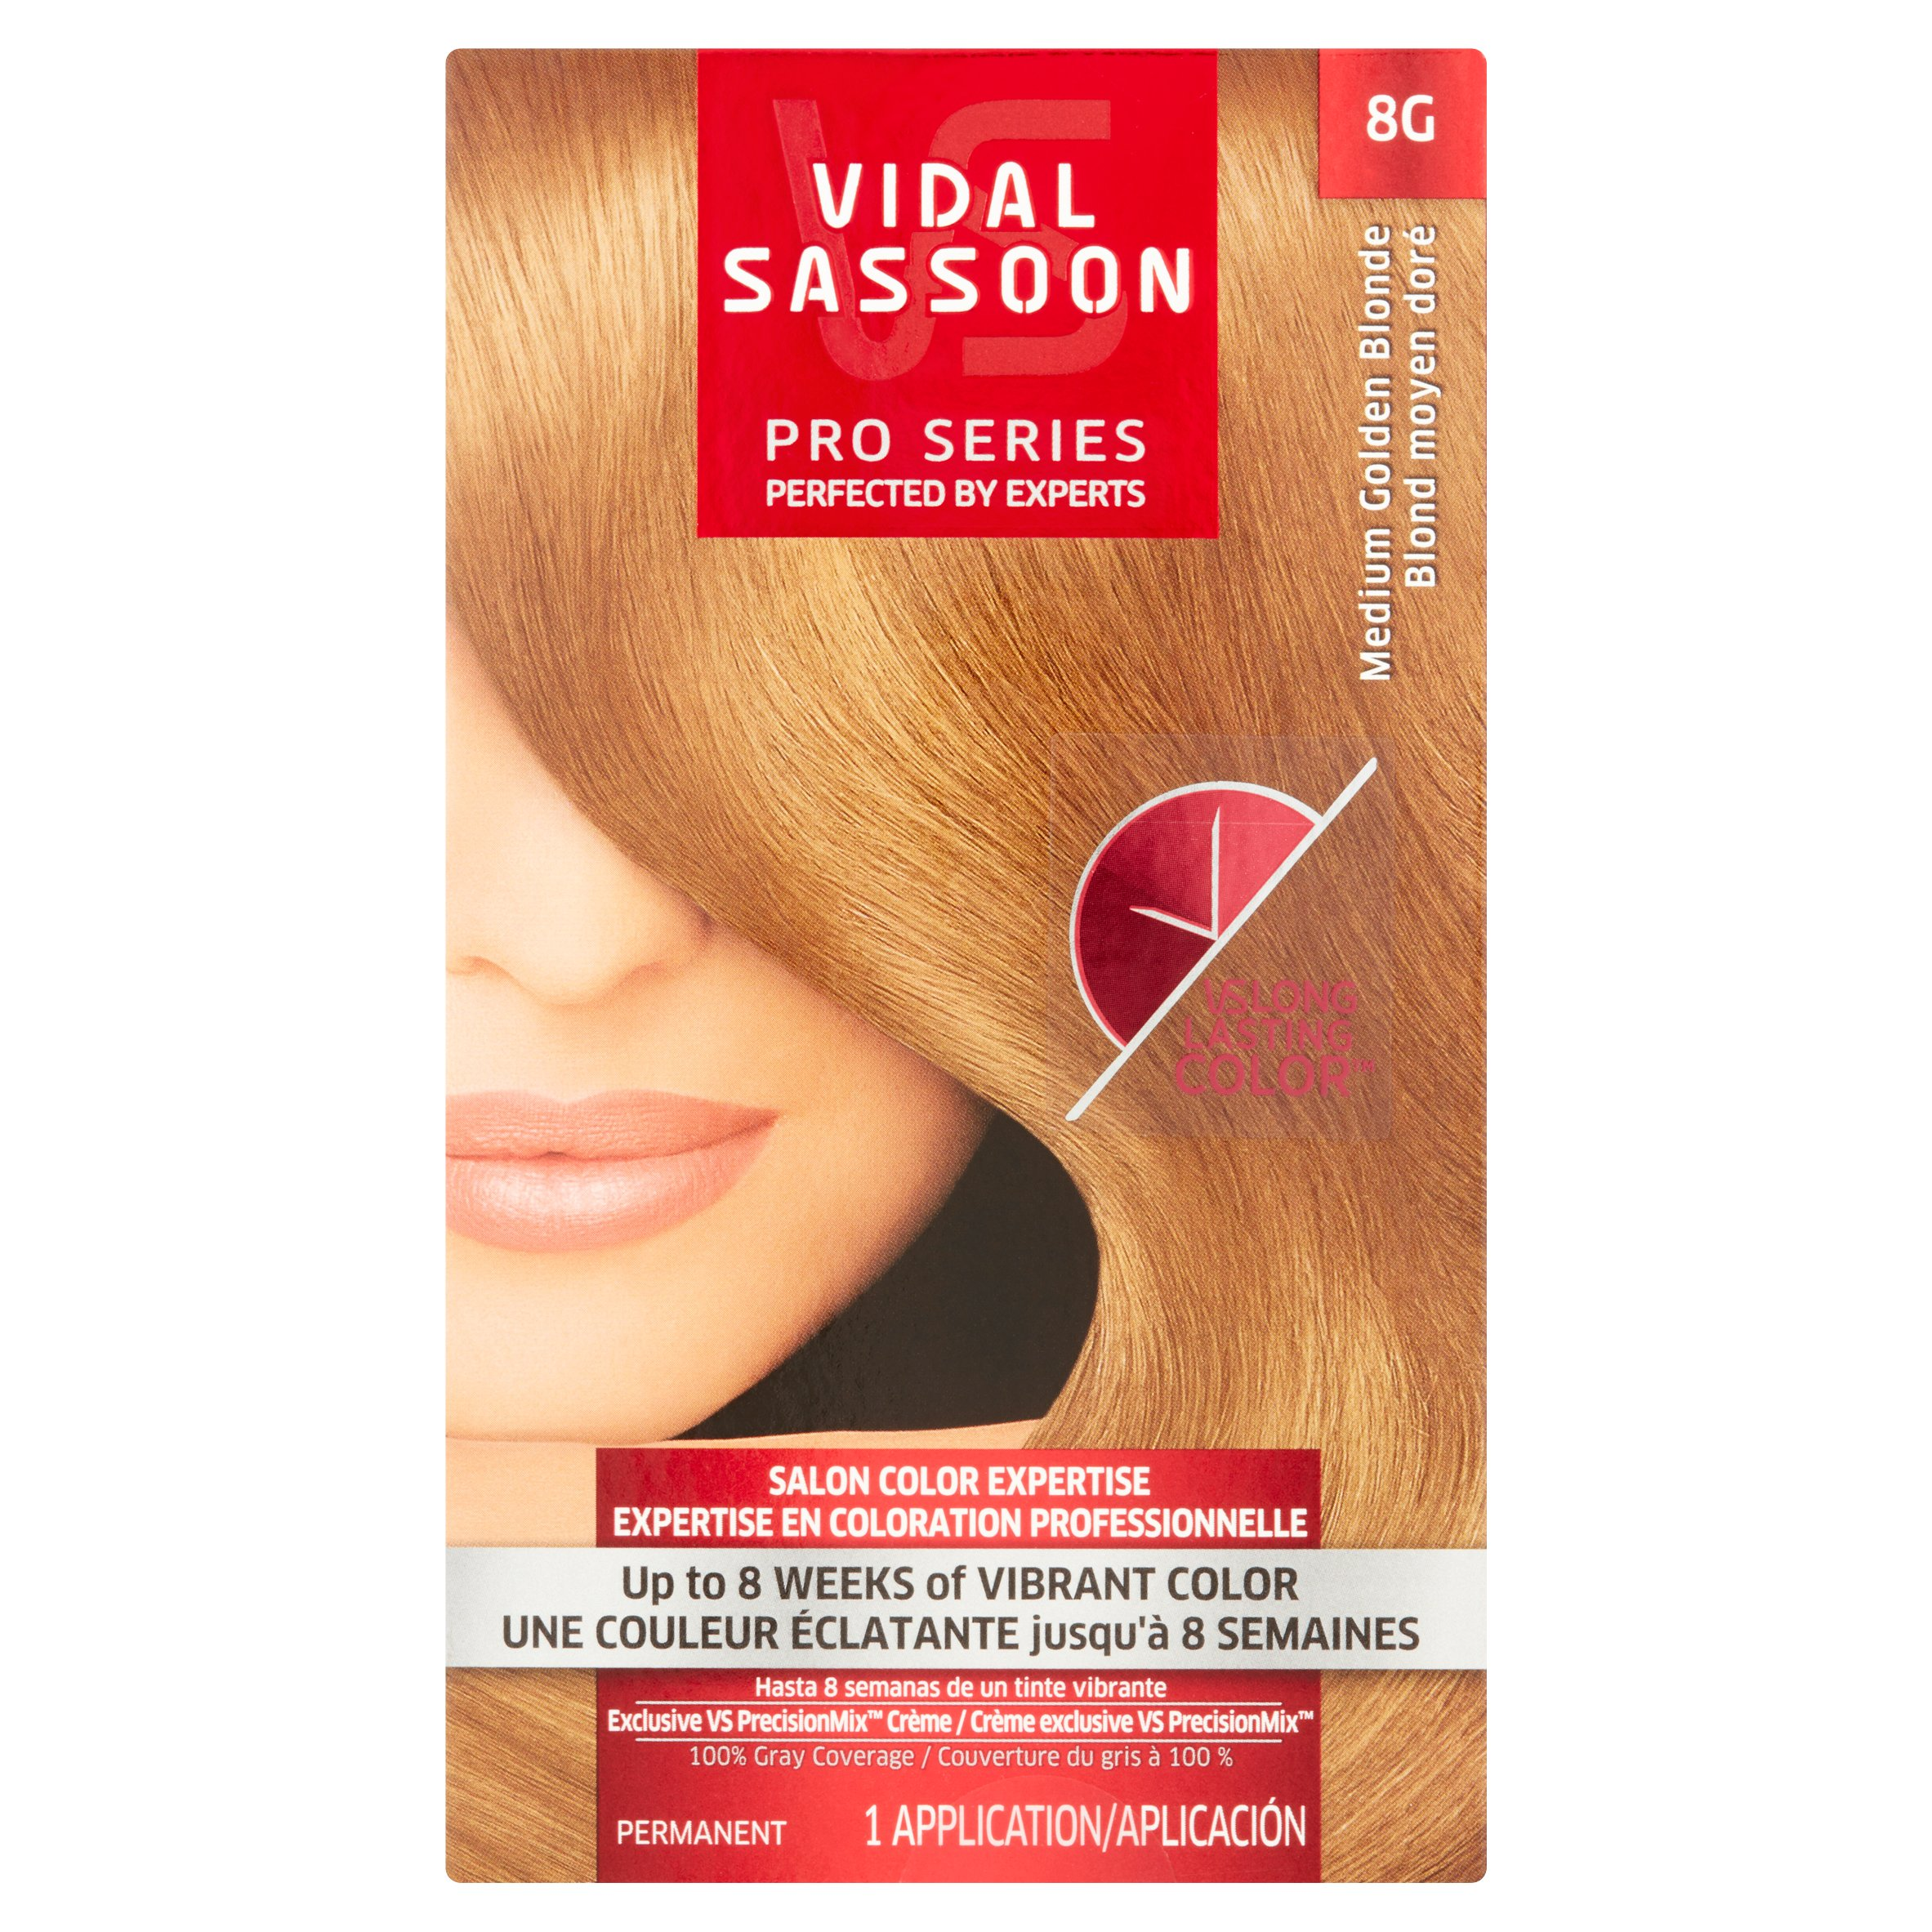 Vidal Sassoon Pro Series 5vr London Luxe London Lilac Permanent Hair